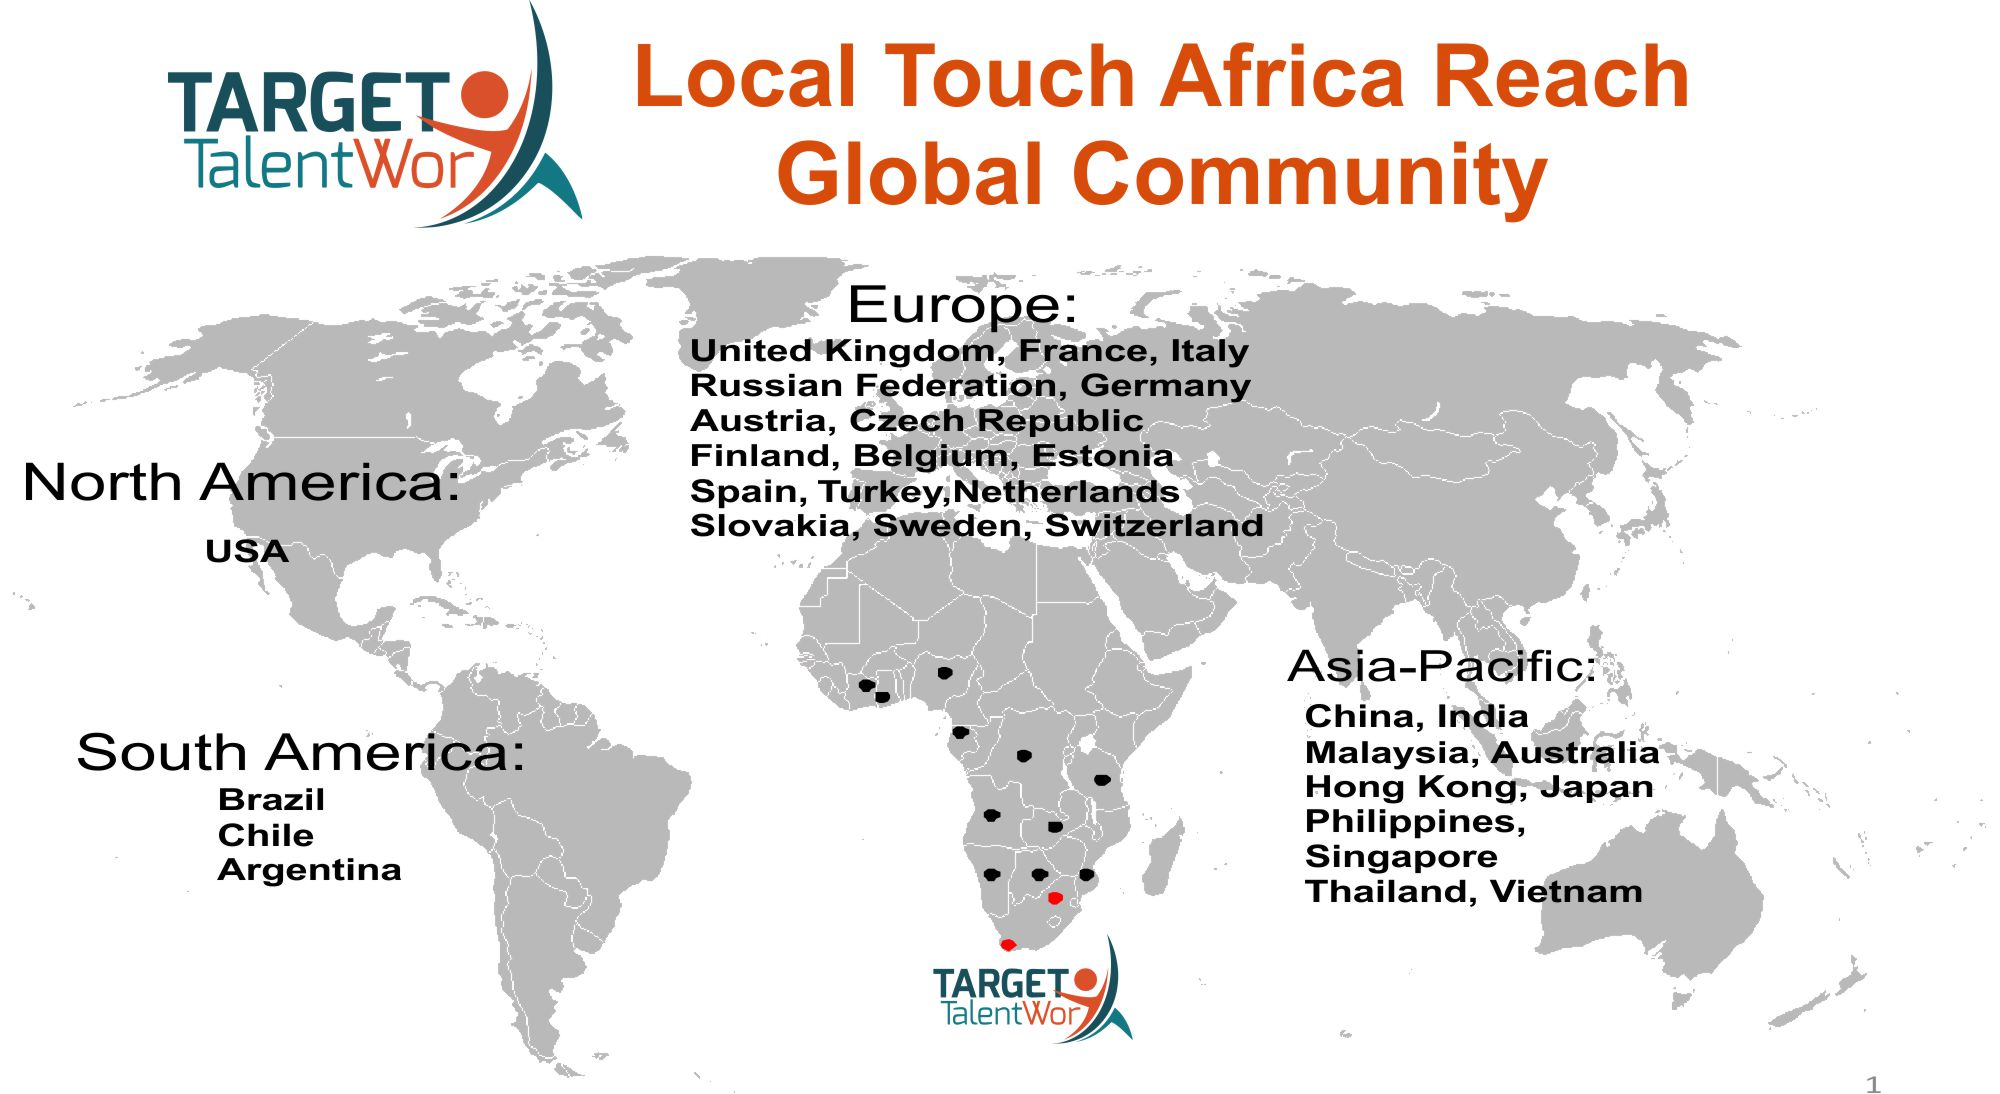 Target TalentWorX World Map - Target TalentWorX on japan world map, israel world map, belarus world map, cambodia world map, indonesia world map, hanoi world map, mekong river world map, pakistan world map, belize world map, france world map, saudi arabia world map, china world map, iran world map, sudan world map, laos world map, southeast asia map, malaysia world map, thailand world map, korea world map, singapore world map,